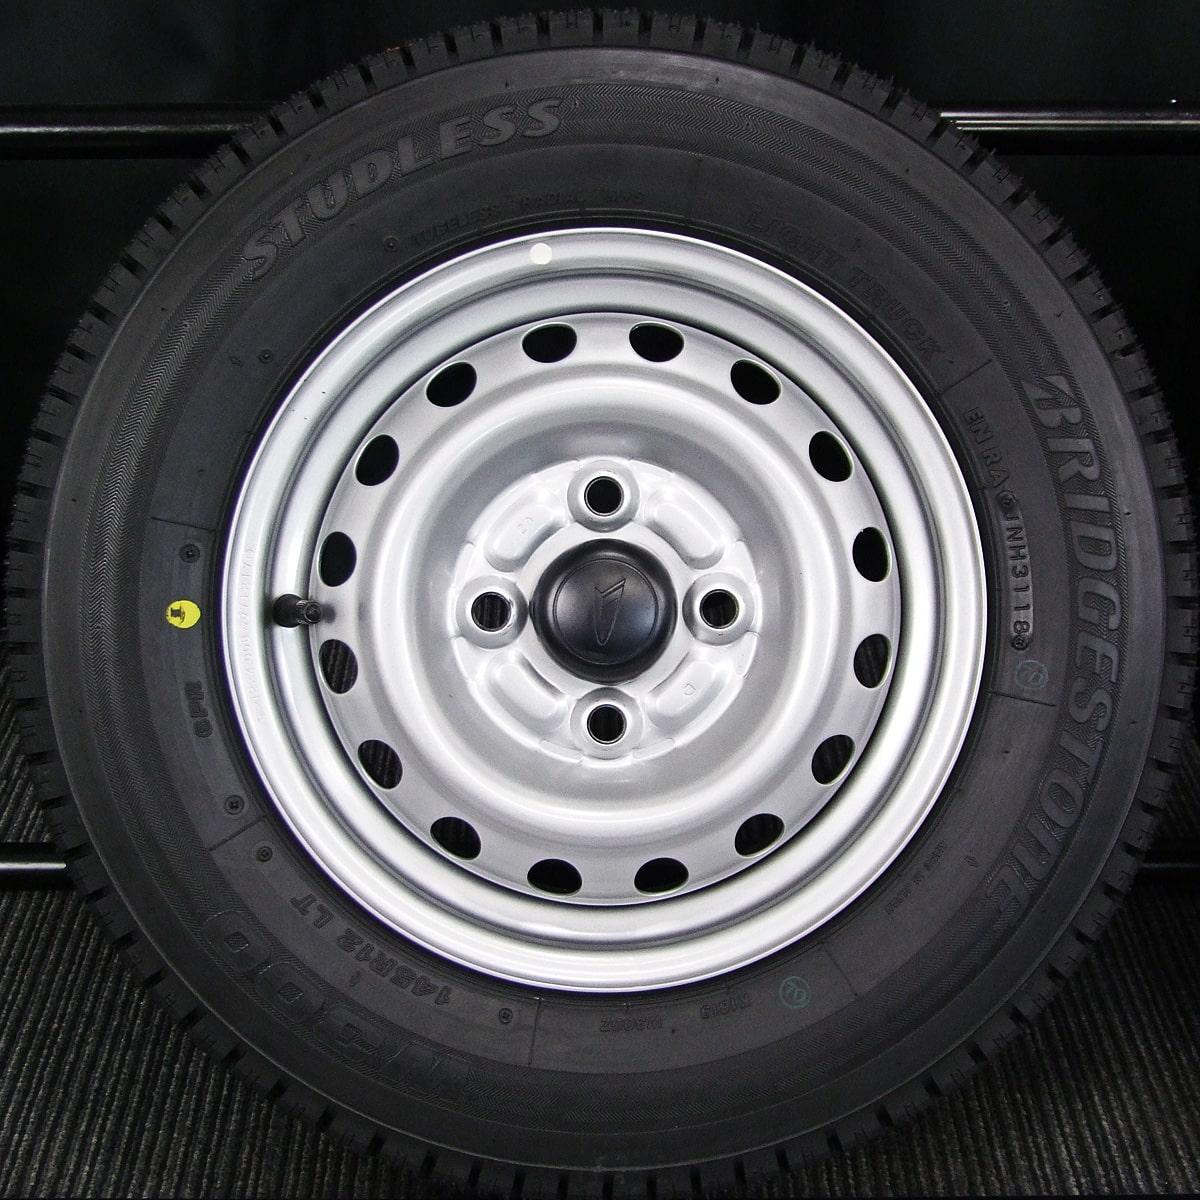 DAIHATSU ハイゼットトラック 純正 シルバースチール BRIDGESTONE W300 145R12LT 6PR 4本SET